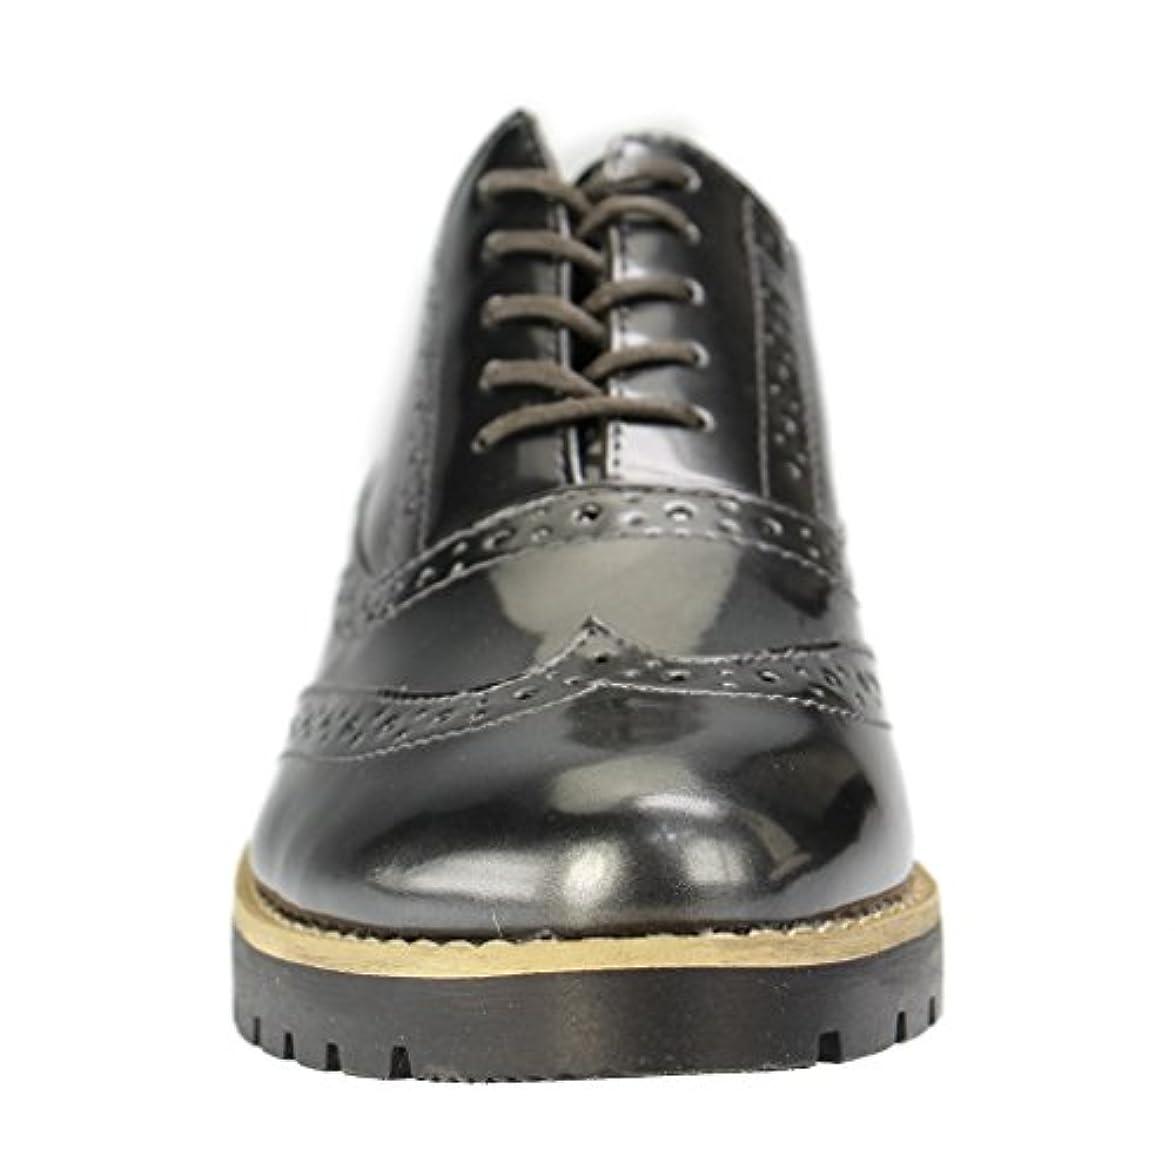 Fitters Scarpe Donna Footwear Grigio Stringate